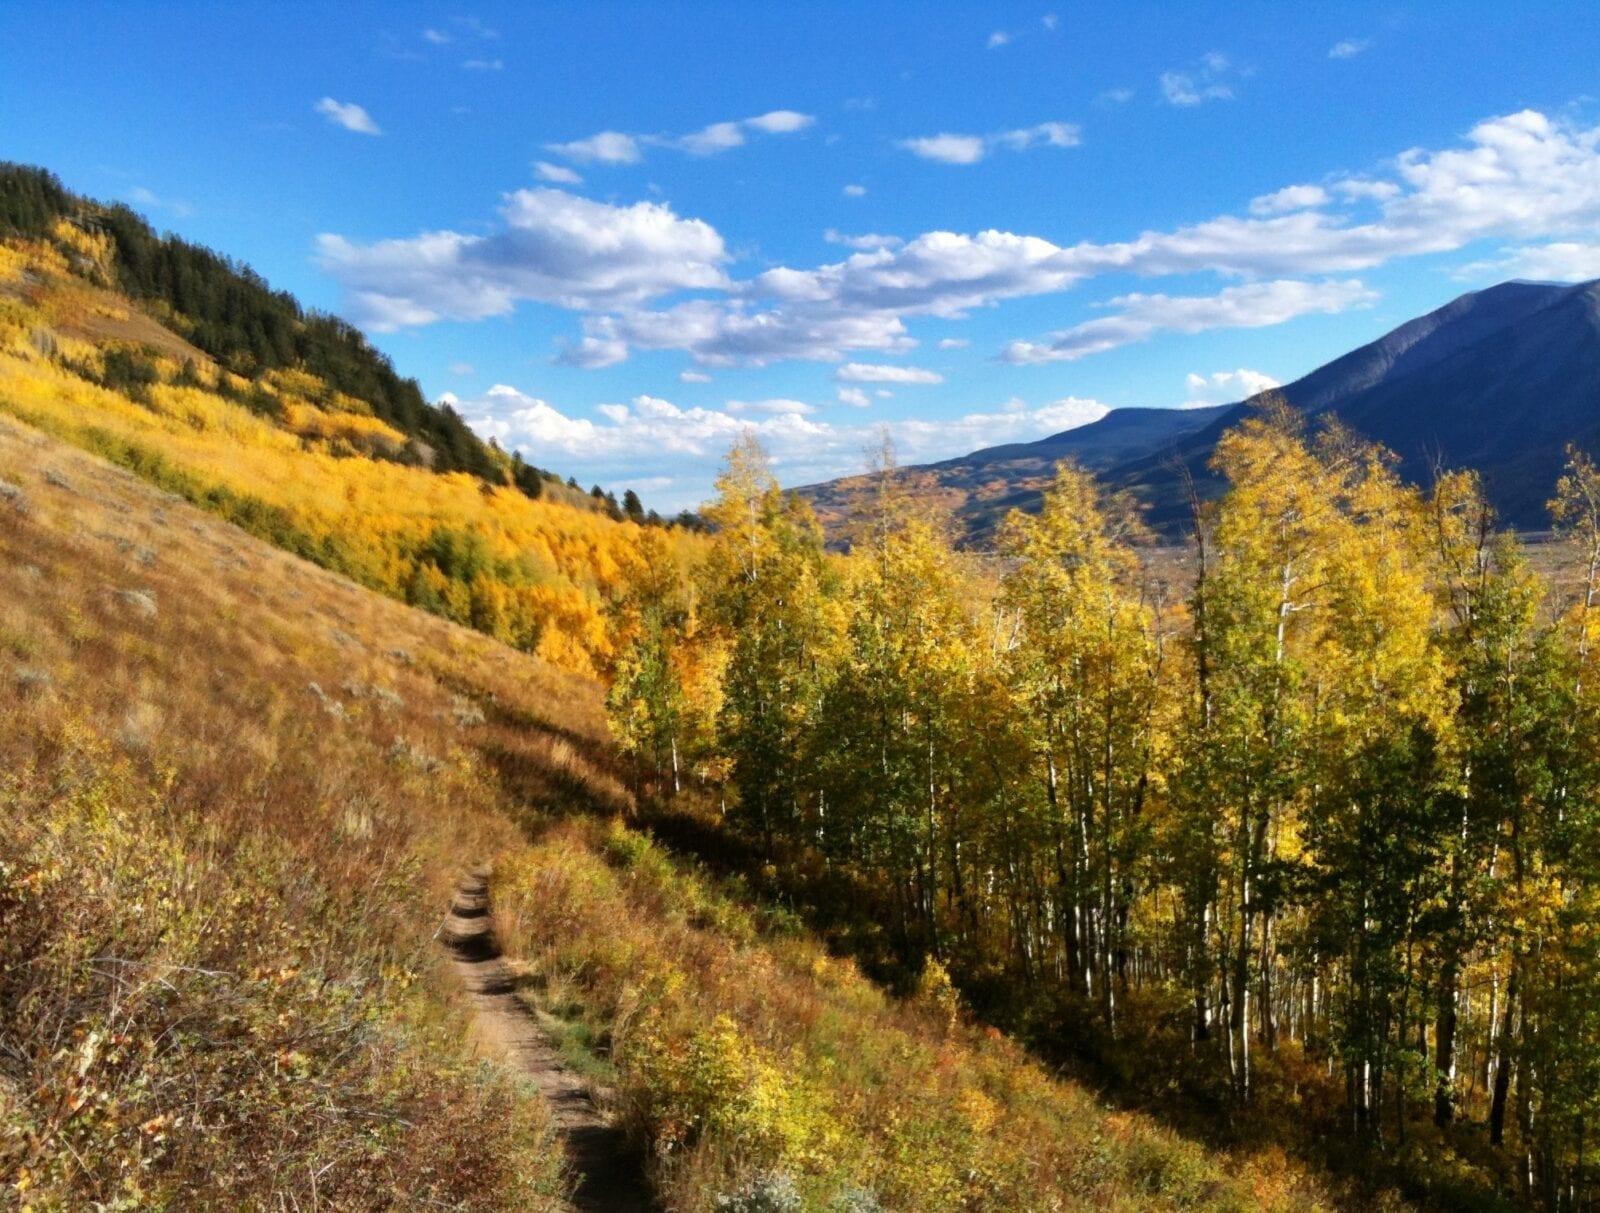 Mountain Biking Upper Loop Trail, Crested Butte, CO, USA